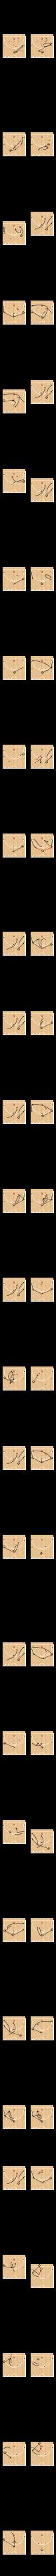 Basketball Play - Penn Quakers - Shuffle Offense Playbook